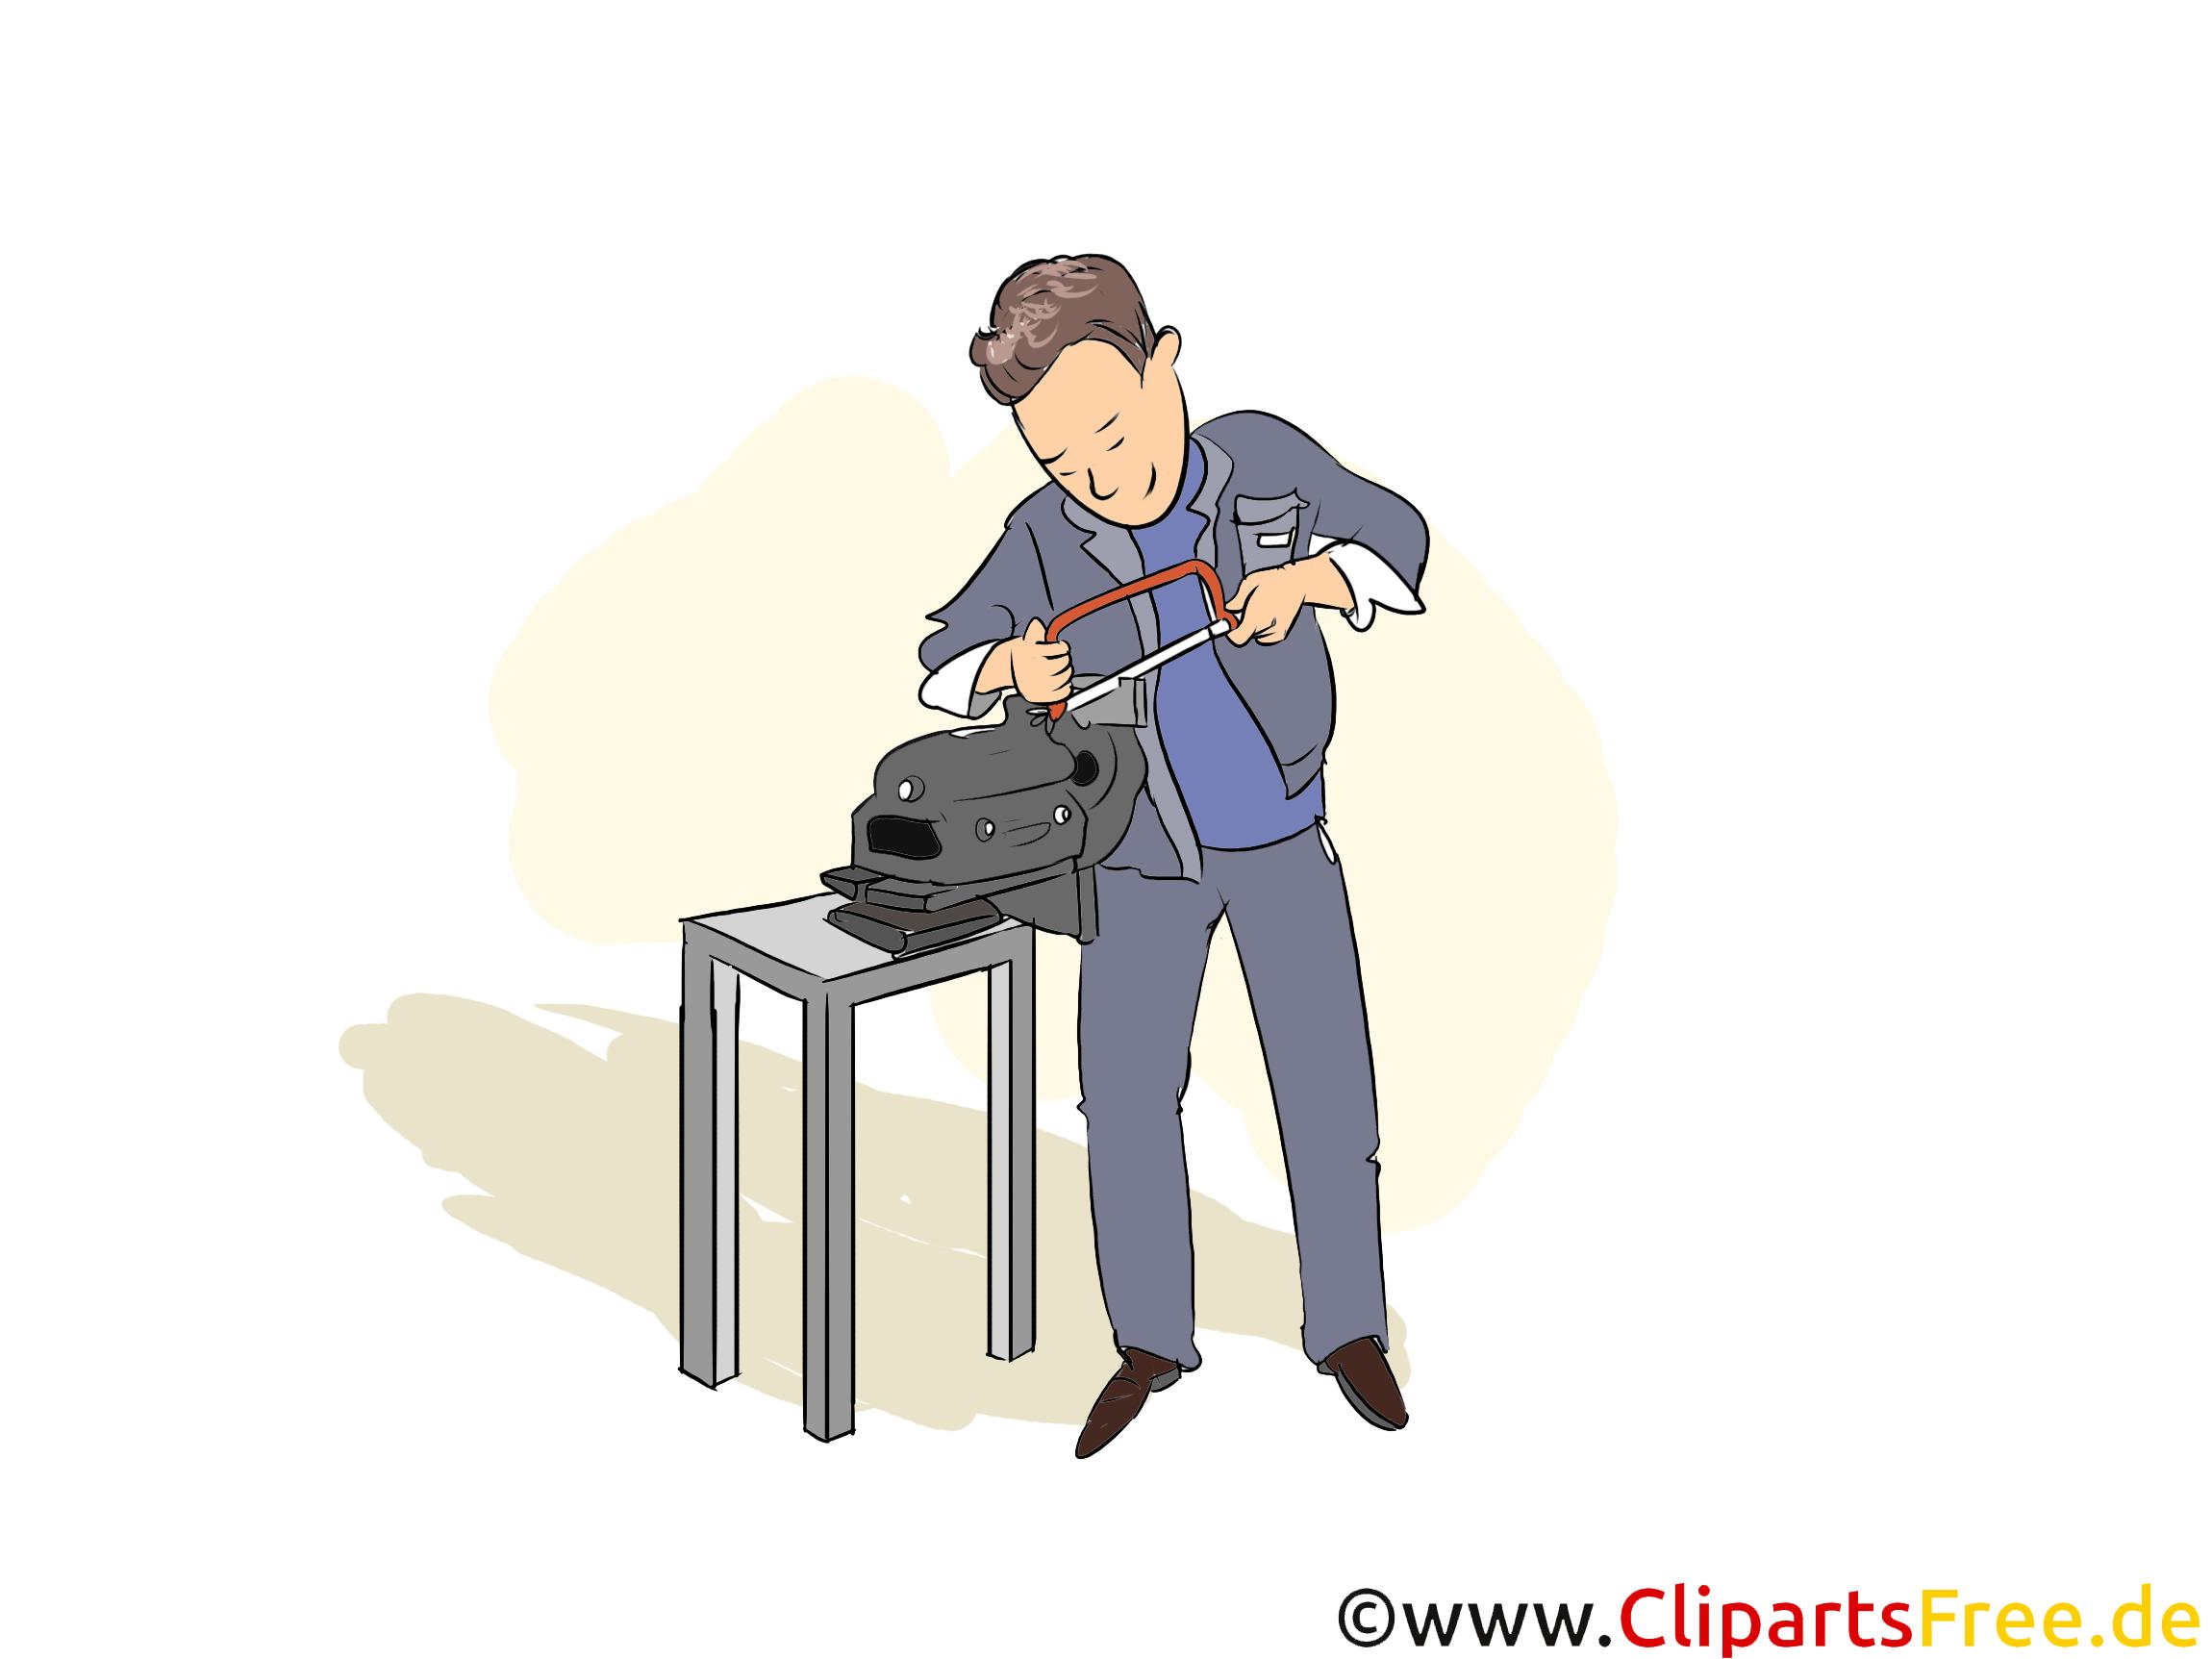 Werkzeugmechaniker Clipart, Bild, Grafik zum Thema Ausbildungsberufe